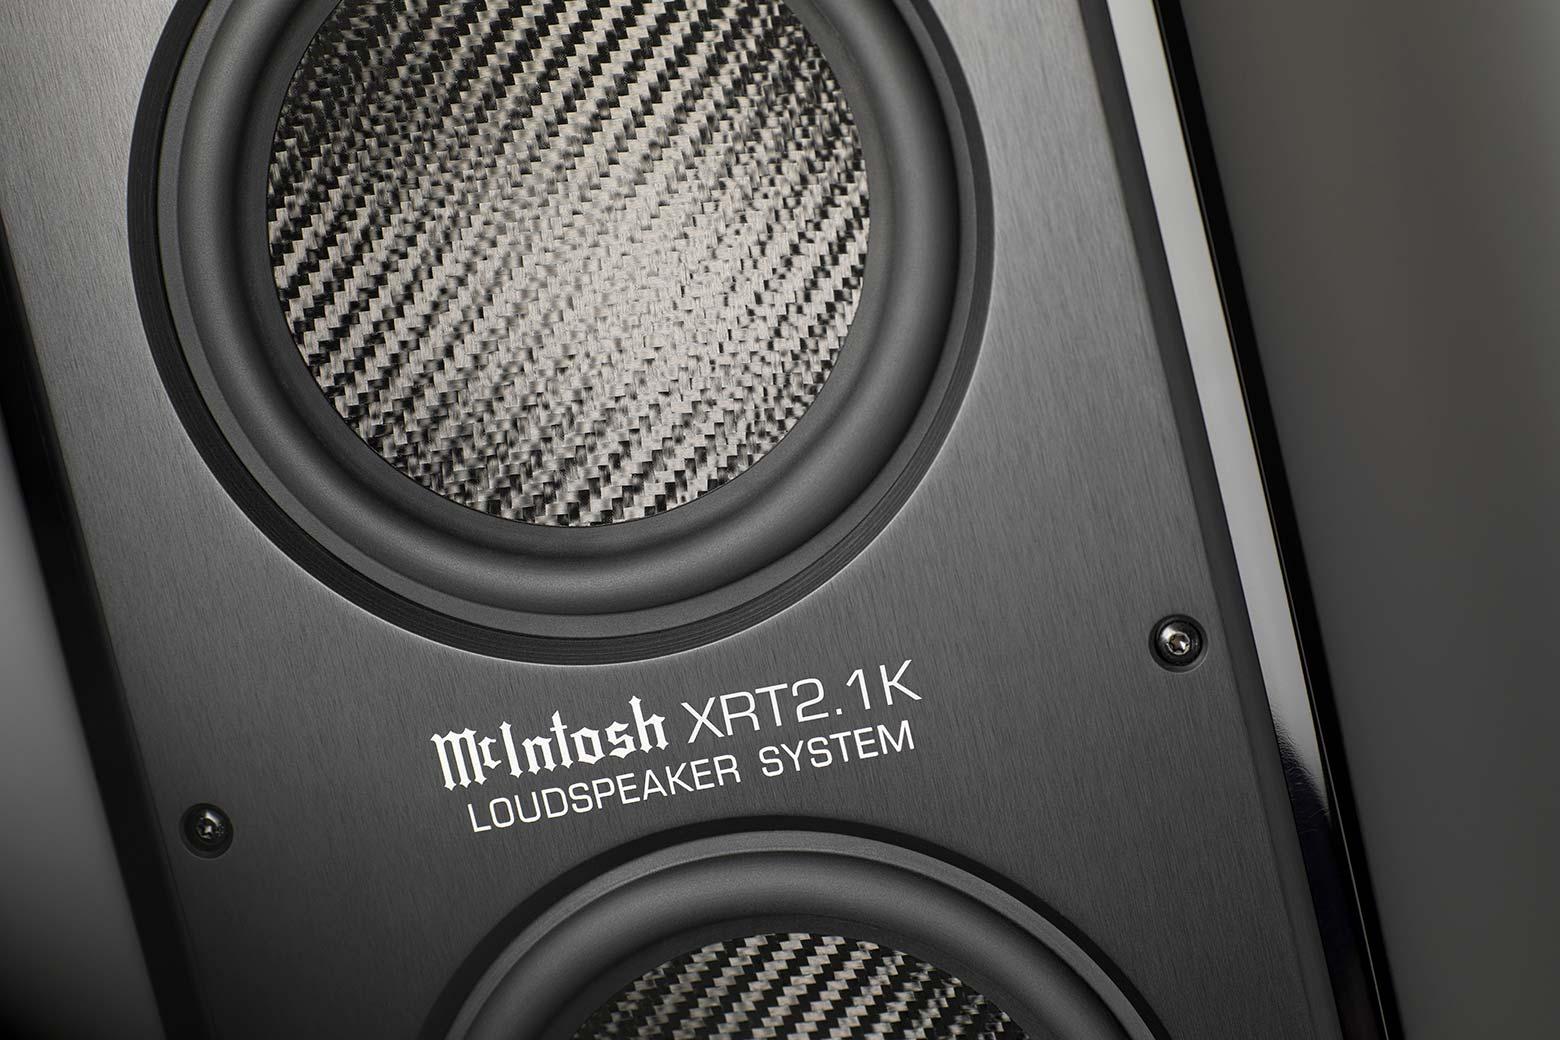 Mcintosh Xrt21k Loudspeaker System Crossover Network Schematic Design